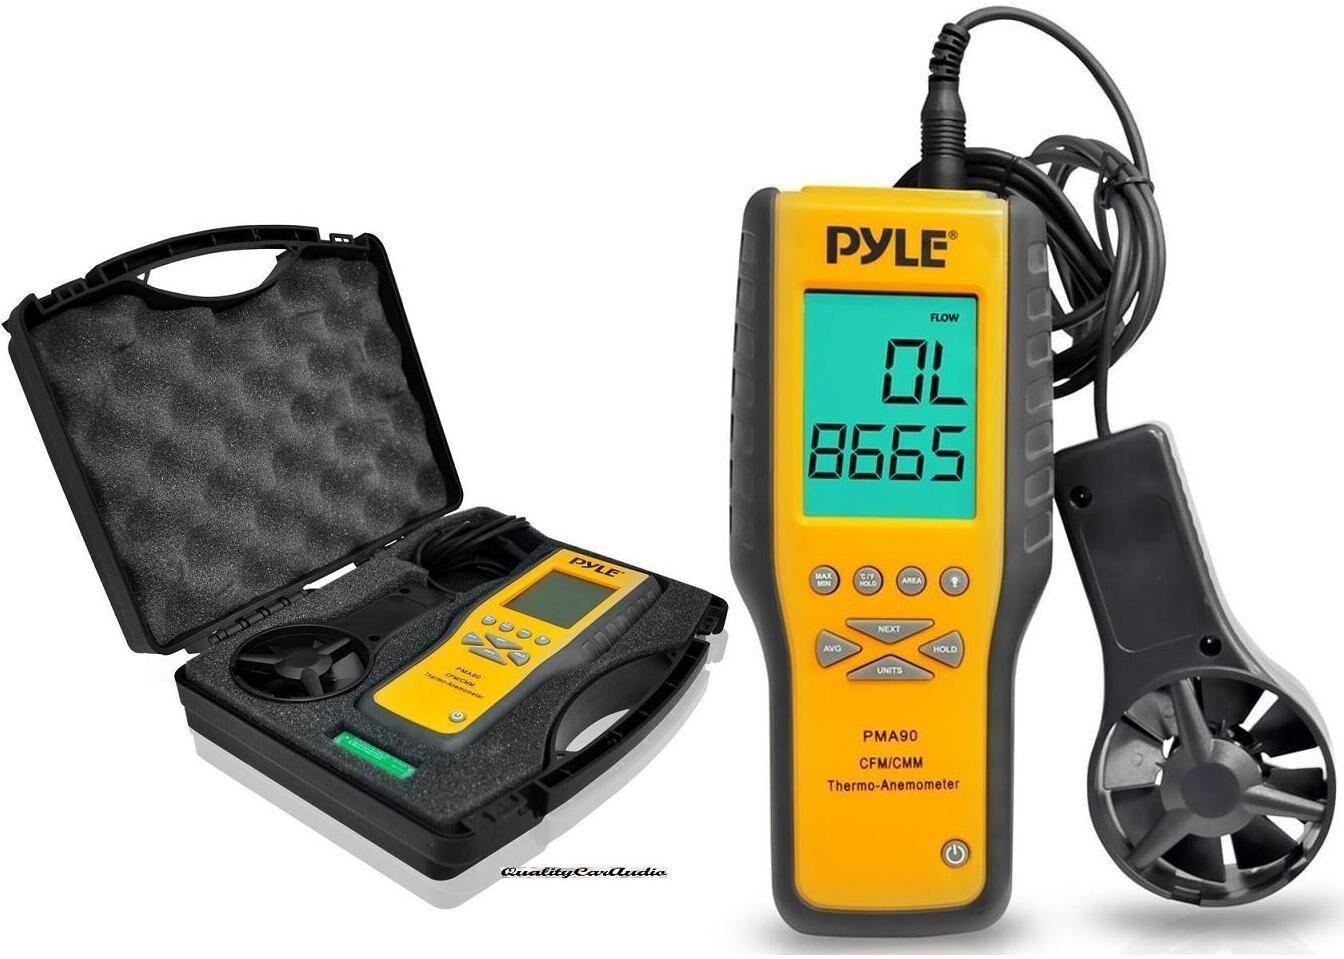 NEW Pyle PMA90 Digital Anemometer Thermometer Air Velocity Flow Temperature Case